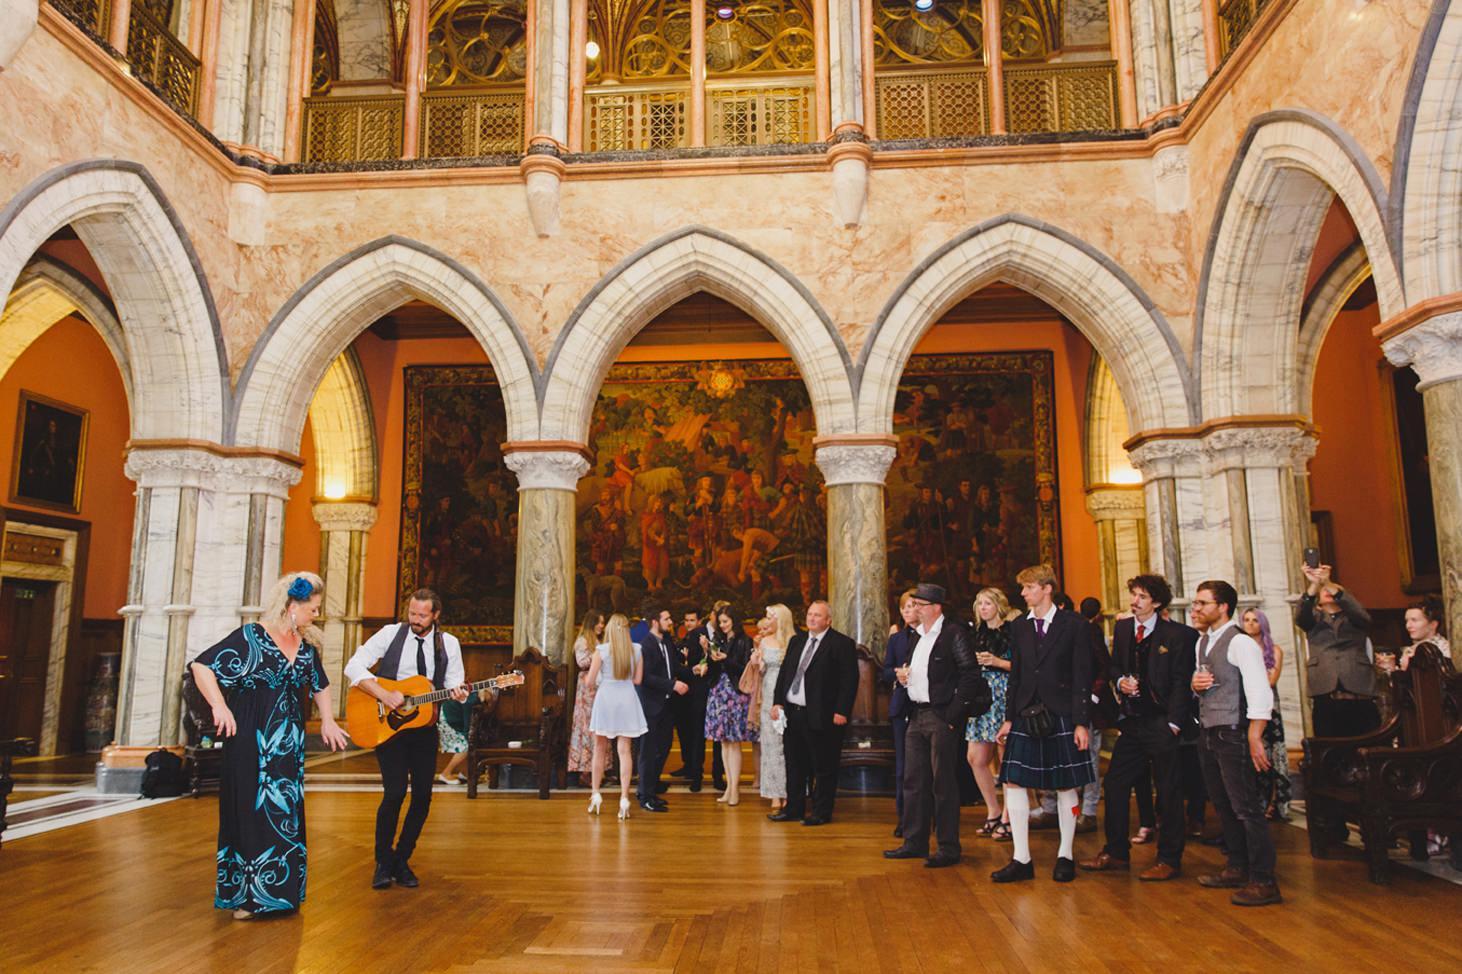 mount stuart wedding photography wedding singers in marble hall